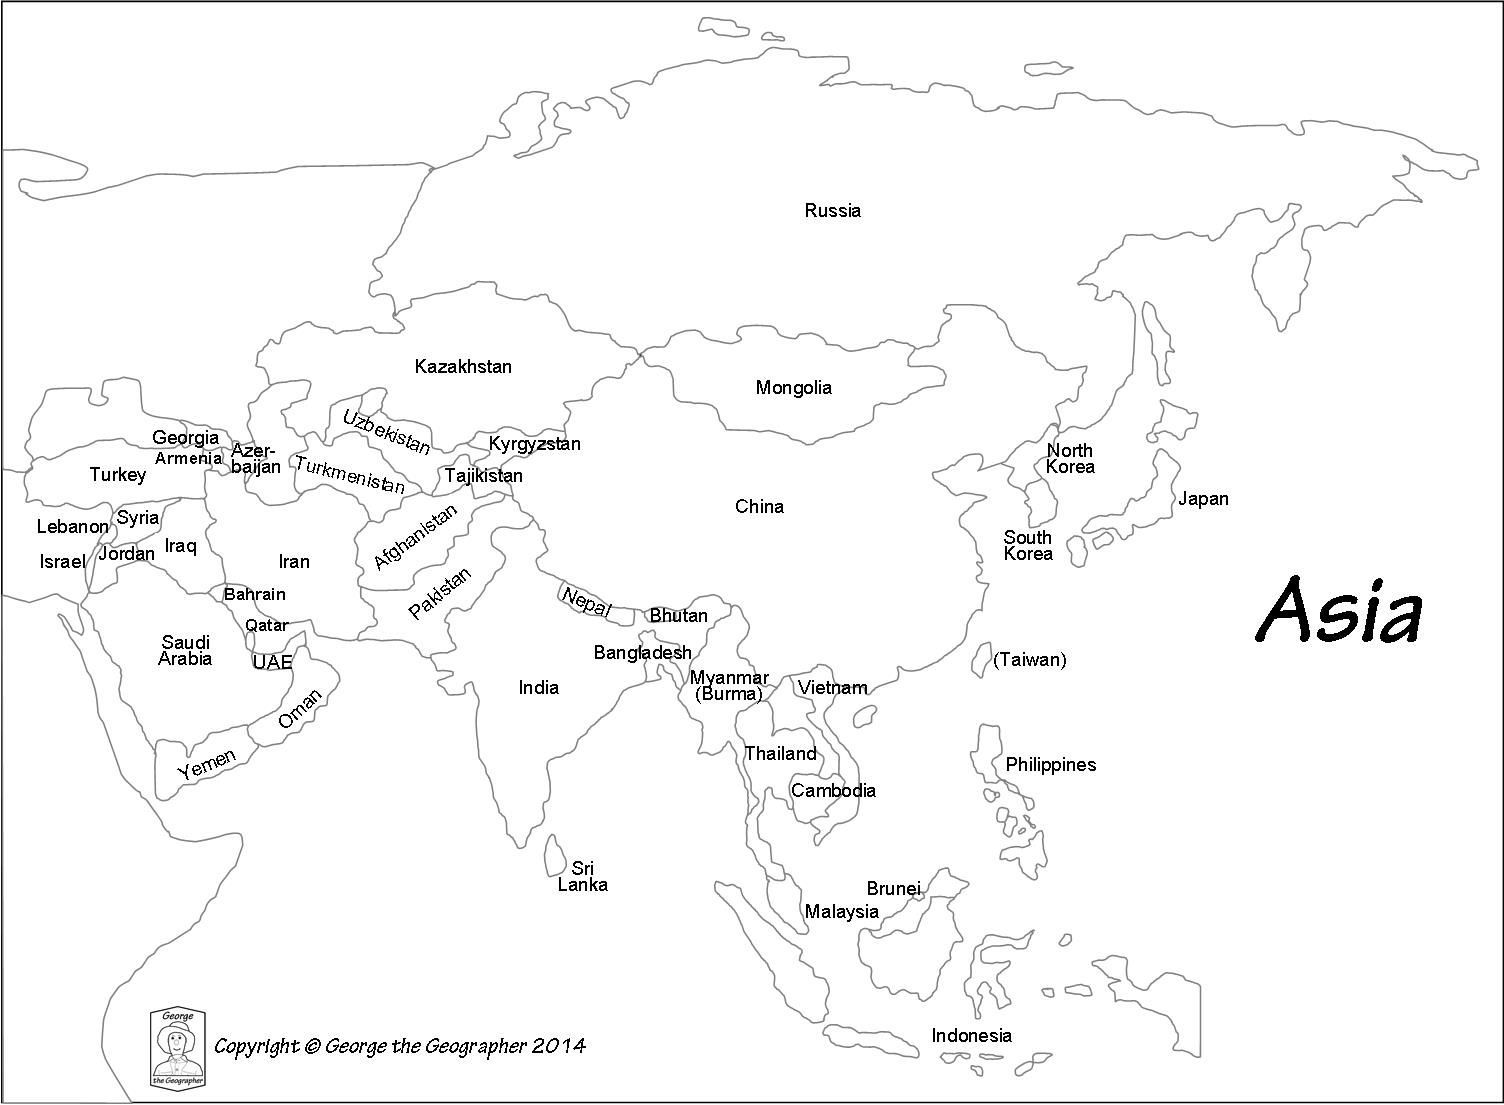 Pin Oleh Natalie Di Bullet Journal Peta Dunia Peta Dunia